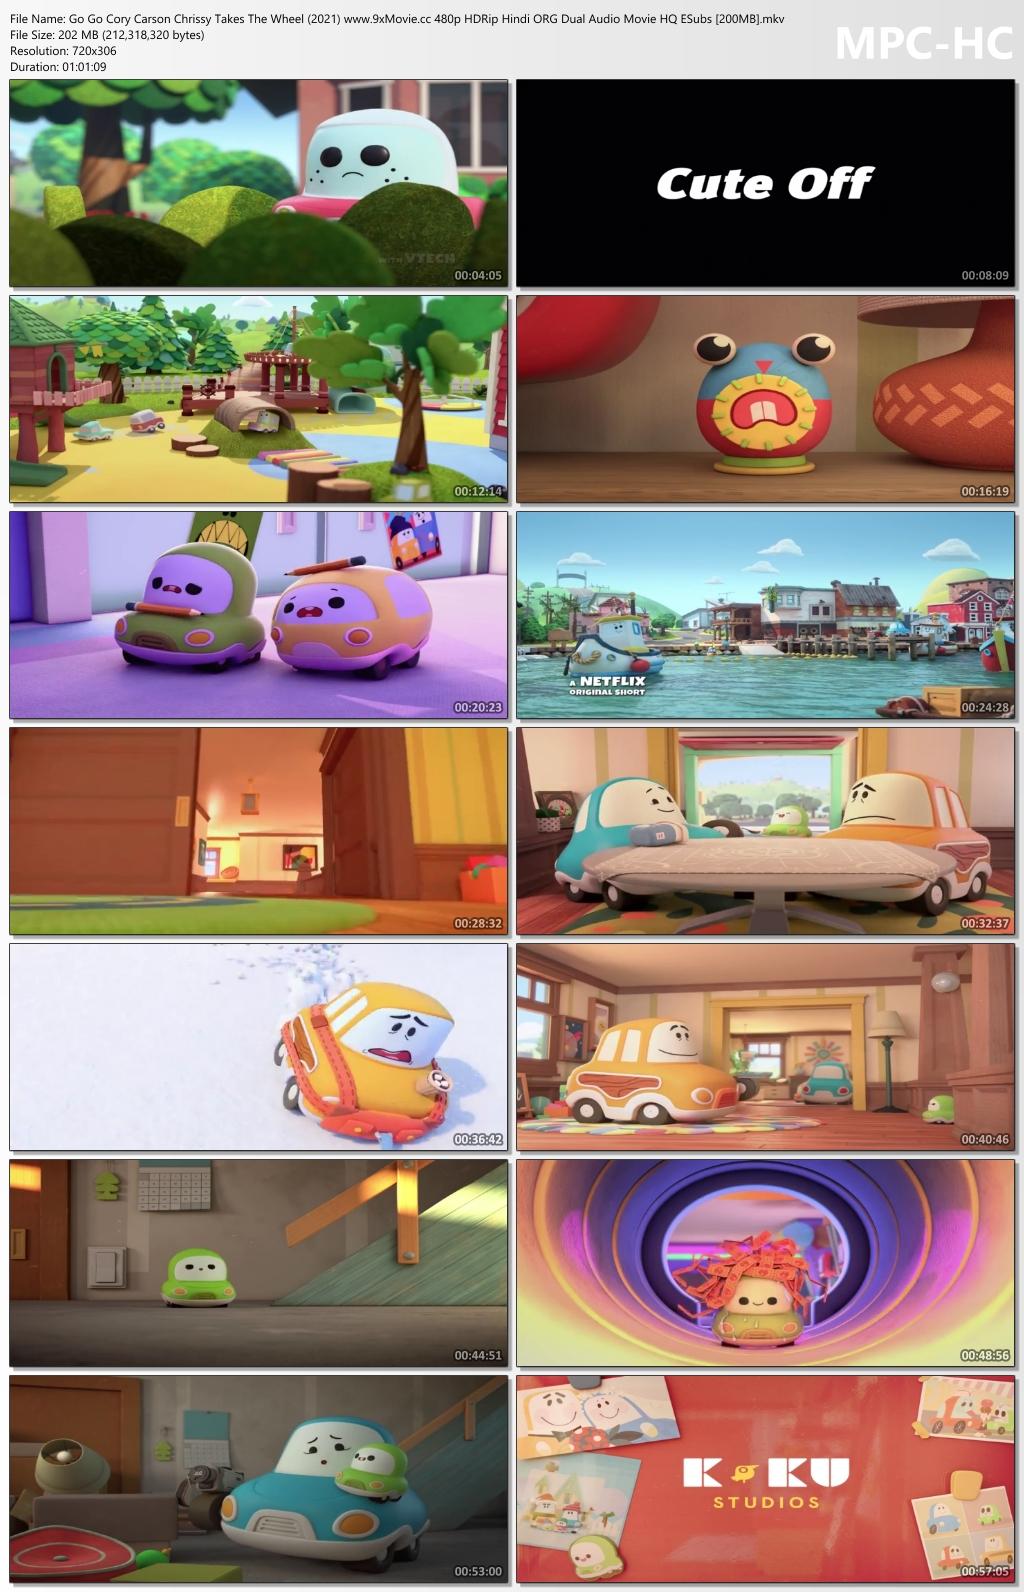 Go-Go-Cory-Carson-Chrissy-Takes-The-Wheel-2021-www-9x-Movie-cc-480p-HDRip-Hindi-ORG-Dual-Audio-Movie